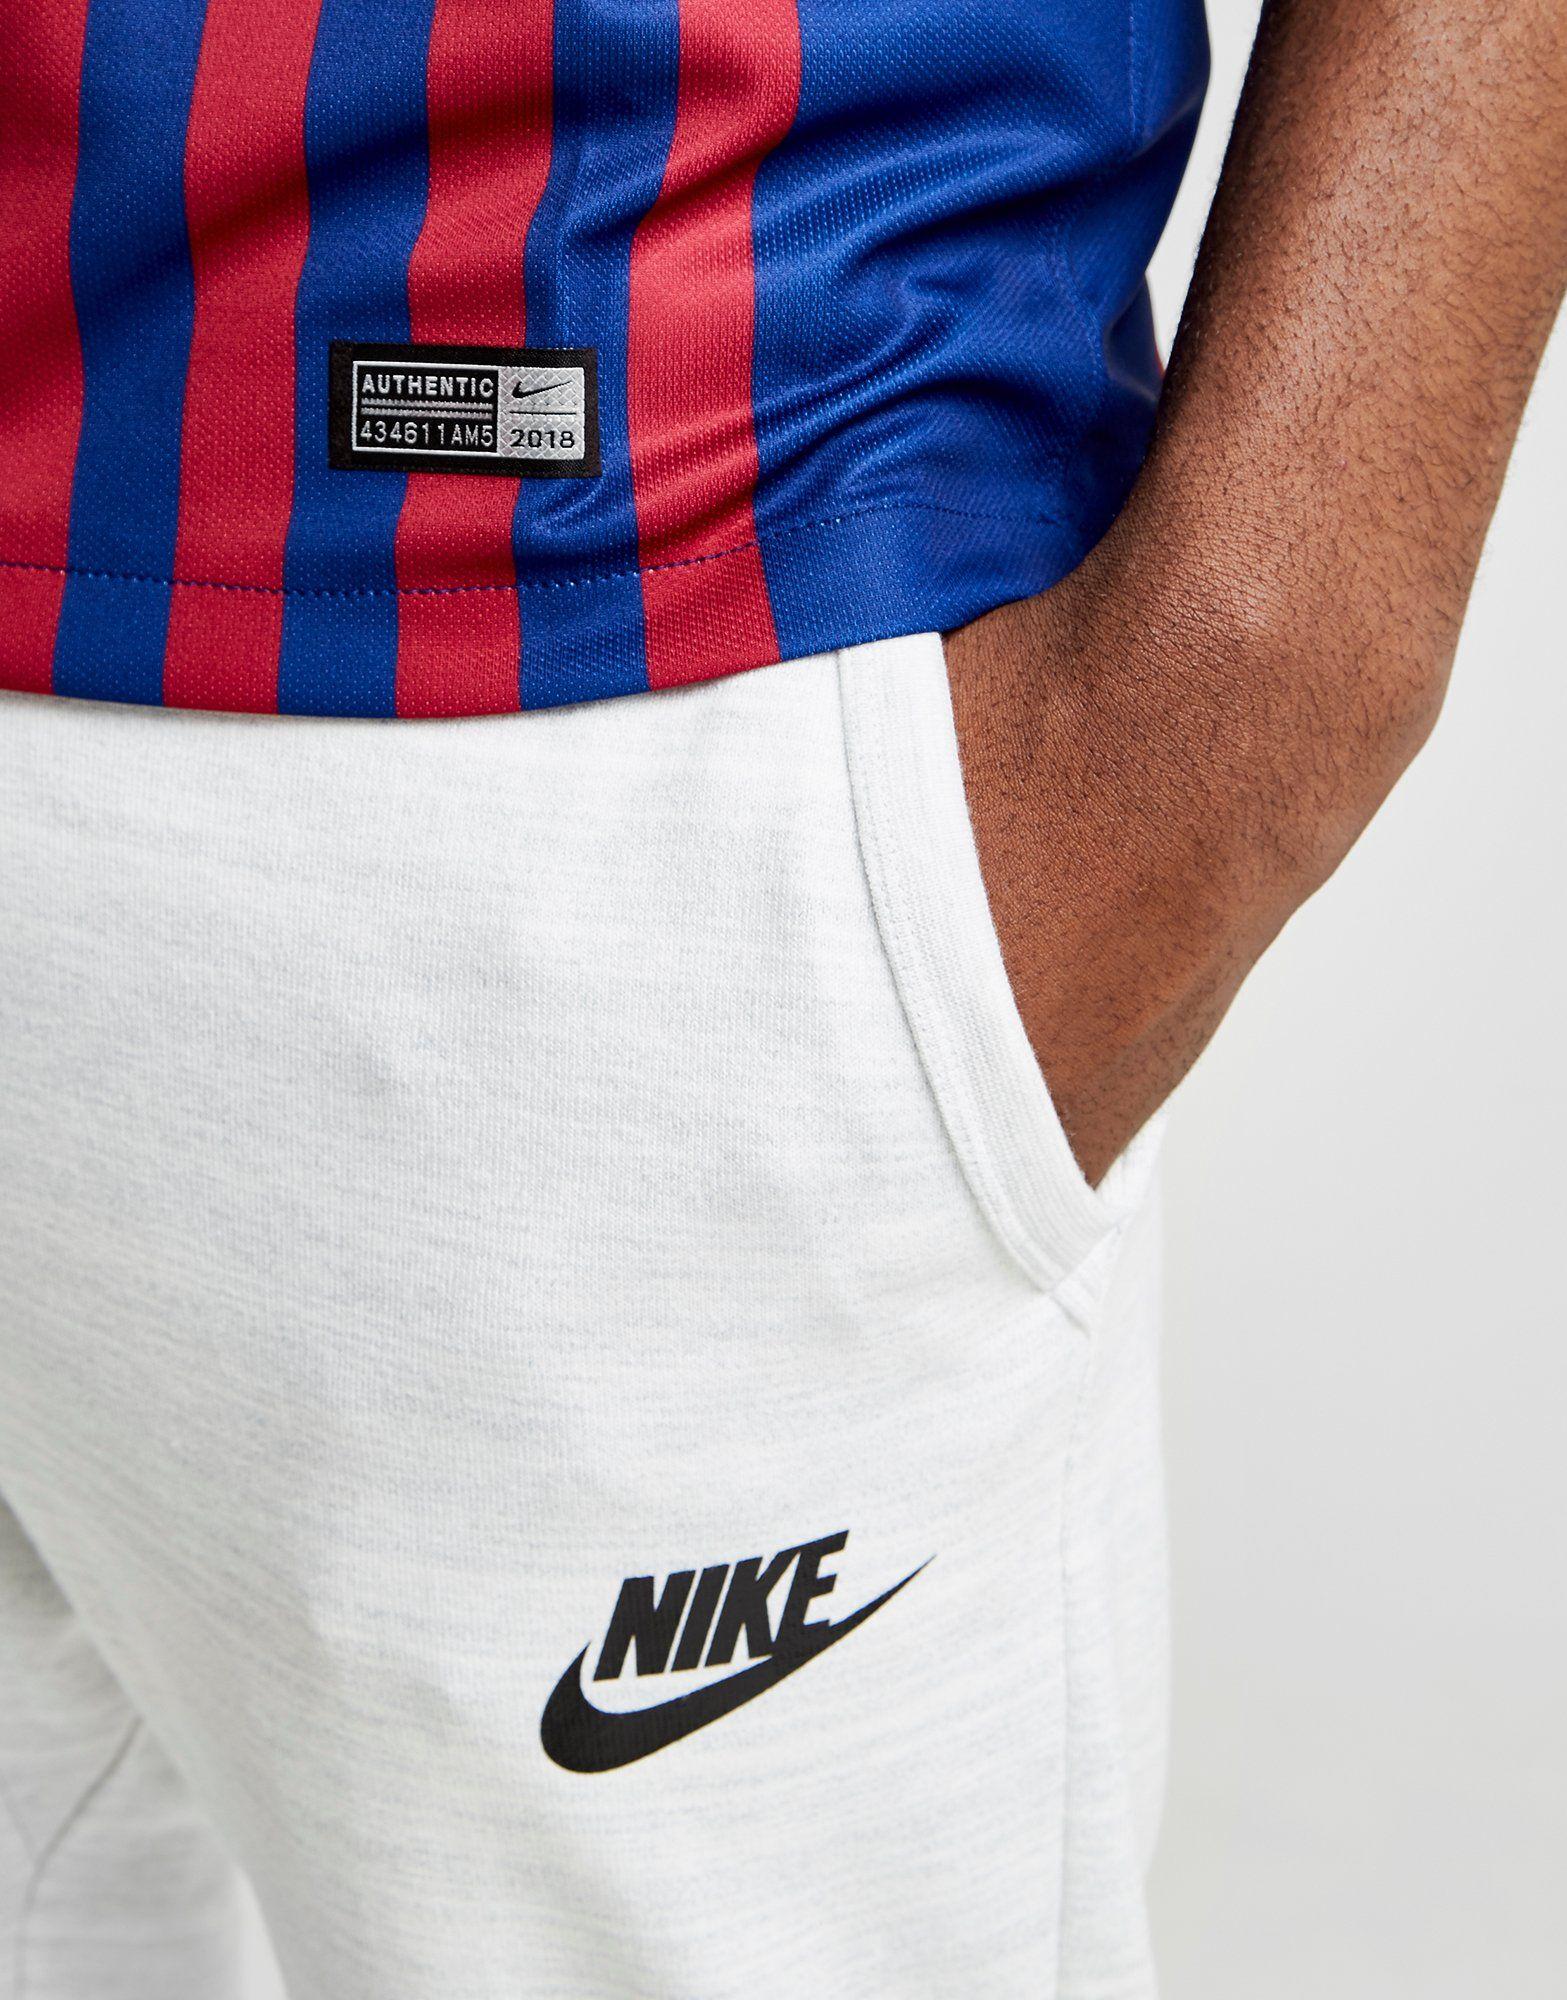 Nike FC Barcelona 2018/19 Home Shirt